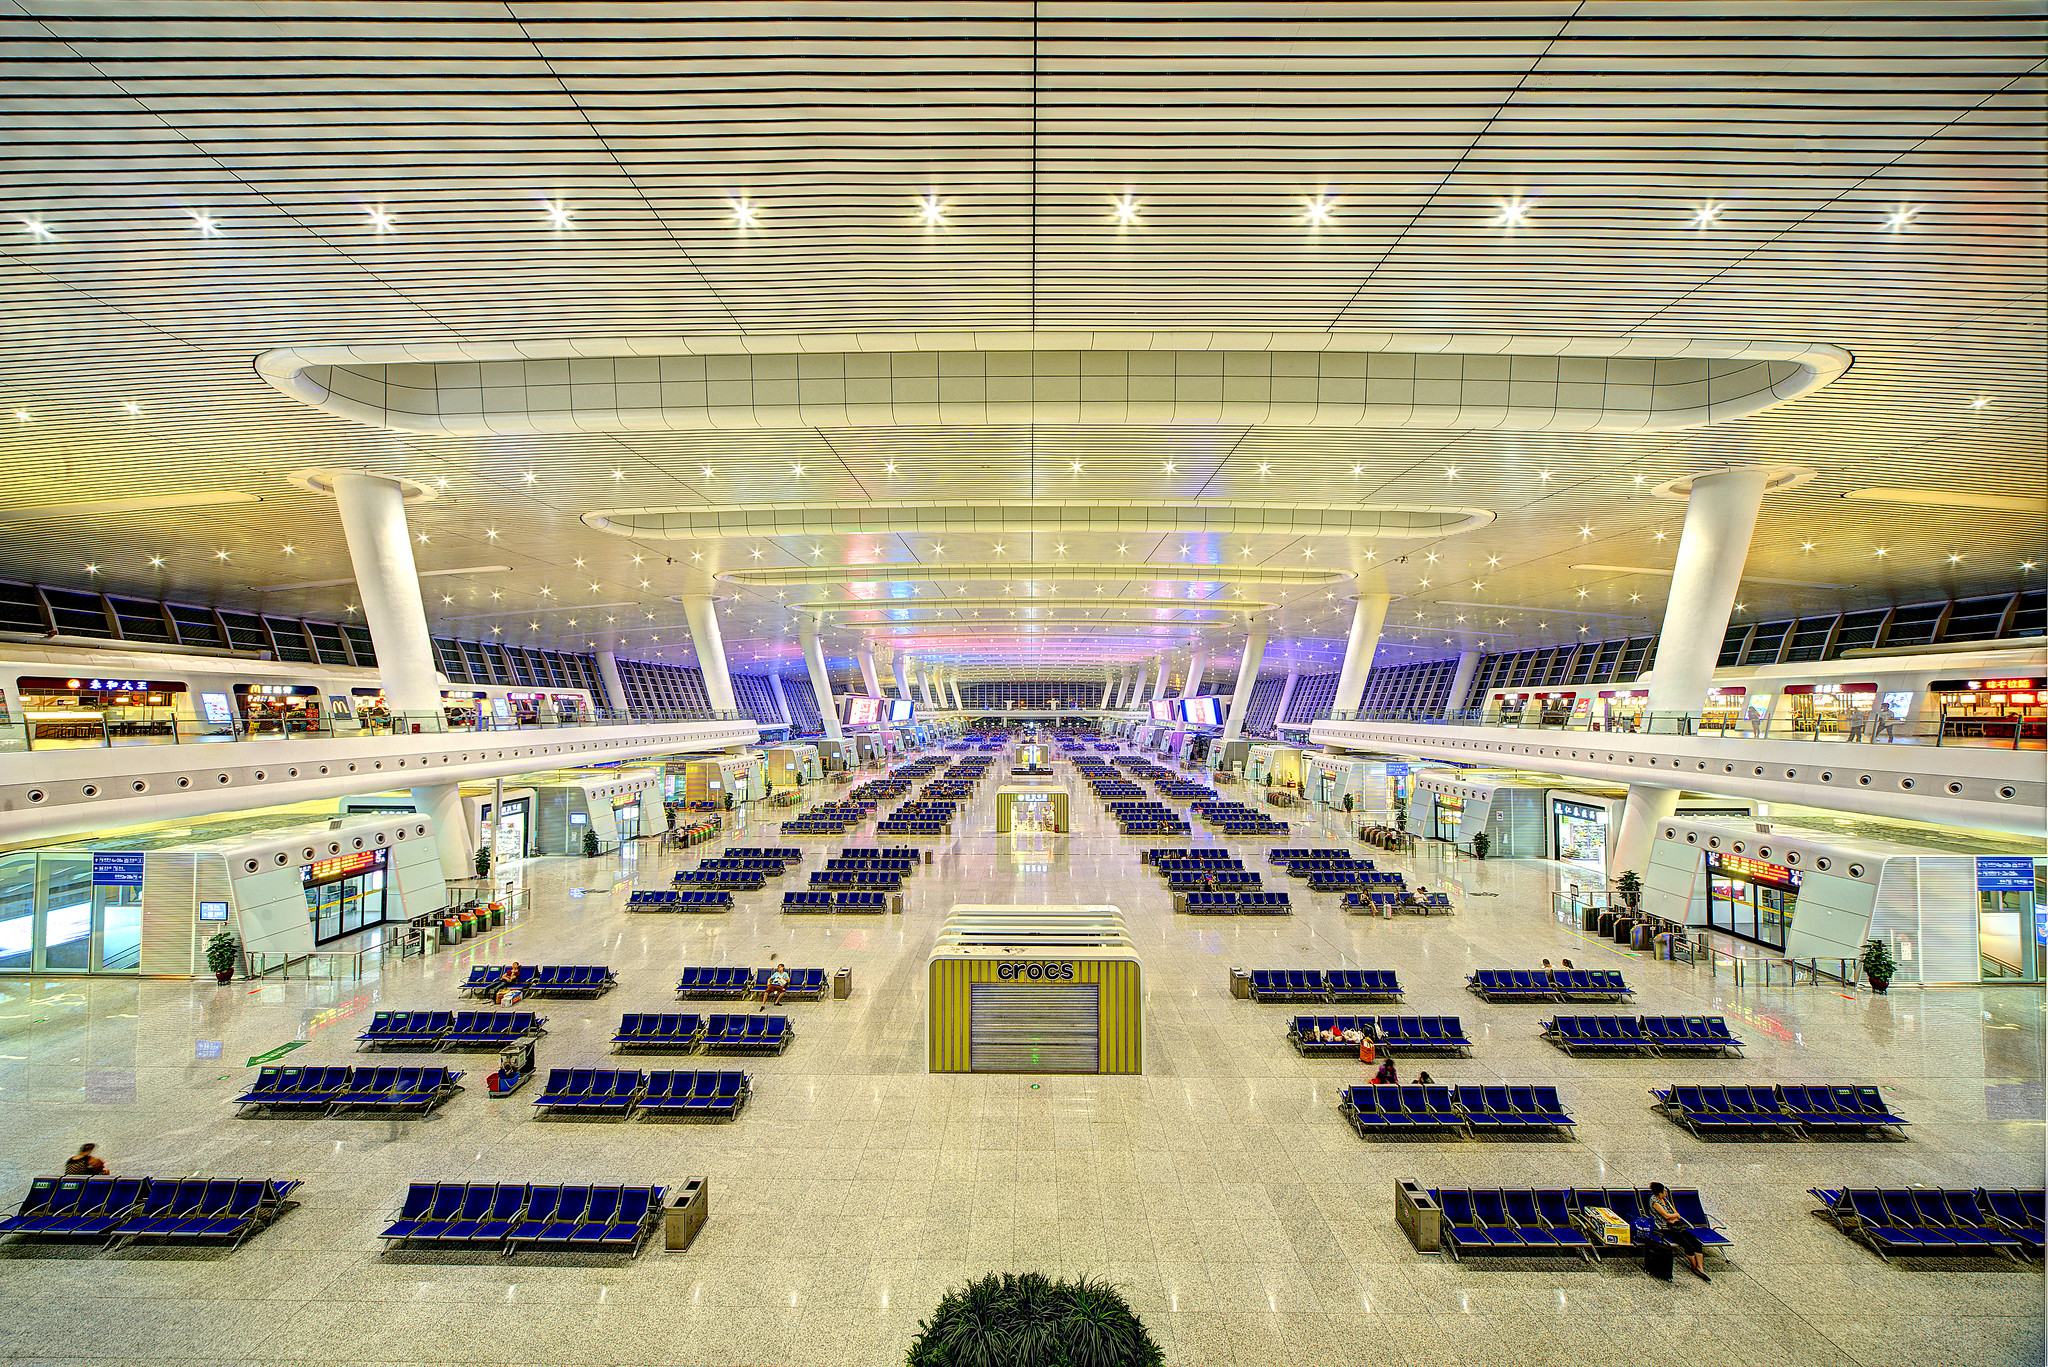 Hangzhou East Railway Station, Interior [2048x1367]